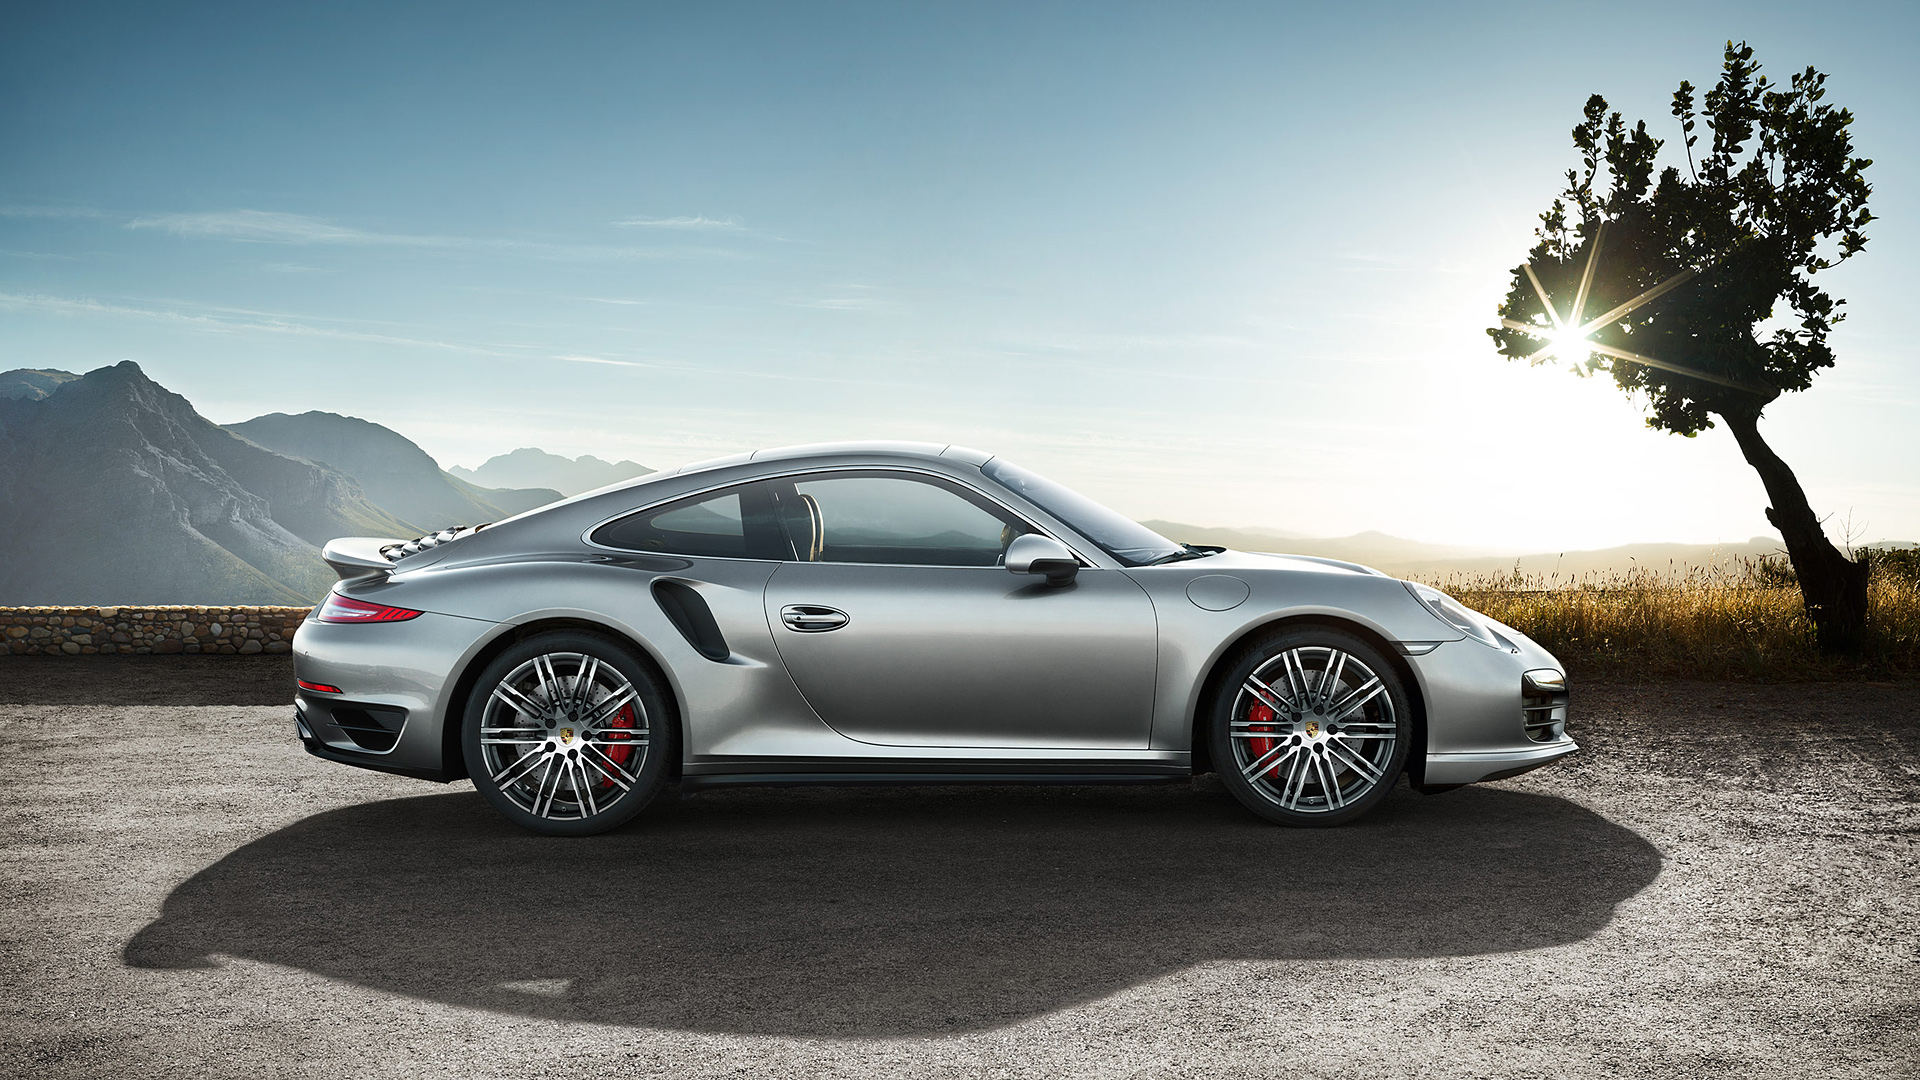 2014 Porsche 911 Turbo Car Wallpaper   HD 1920x1080